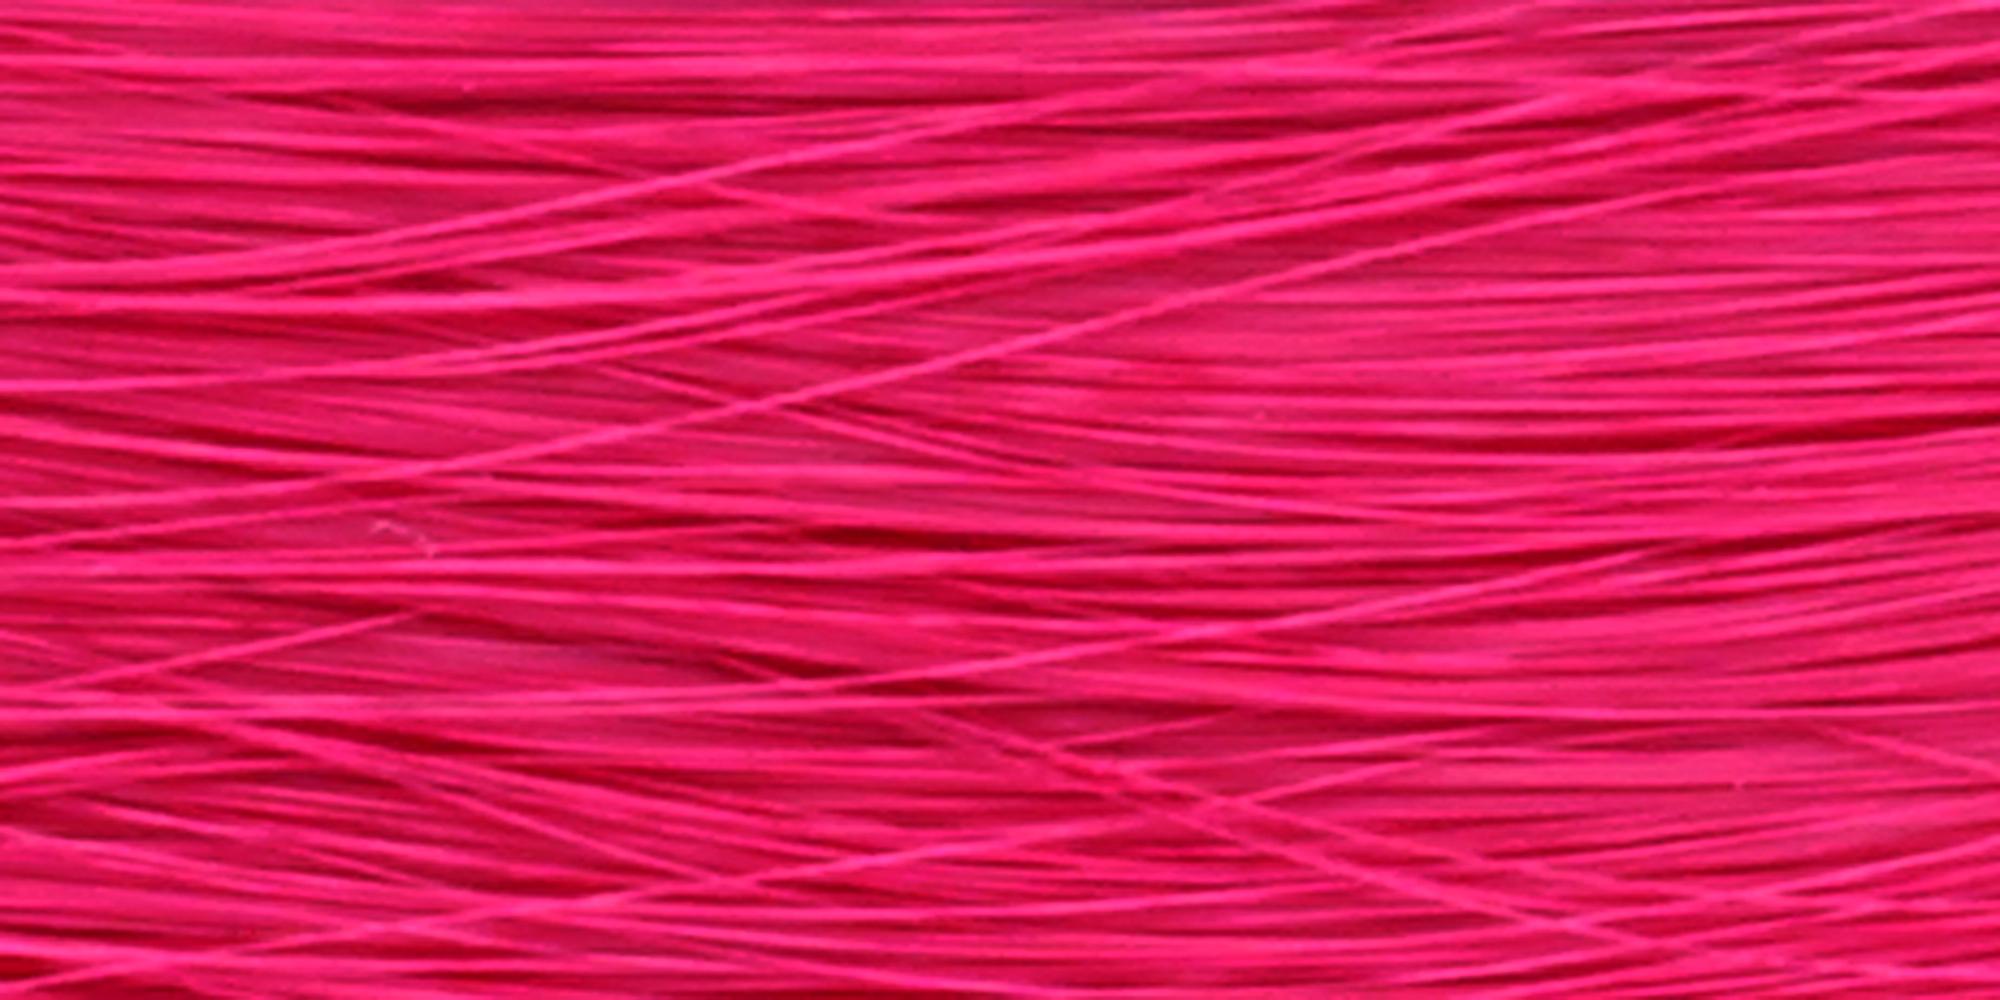 Stargazer-Baby-Hair-Extension-Synthetic-Clip-on-Streak-Various-Colors-43cm thumbnail 28